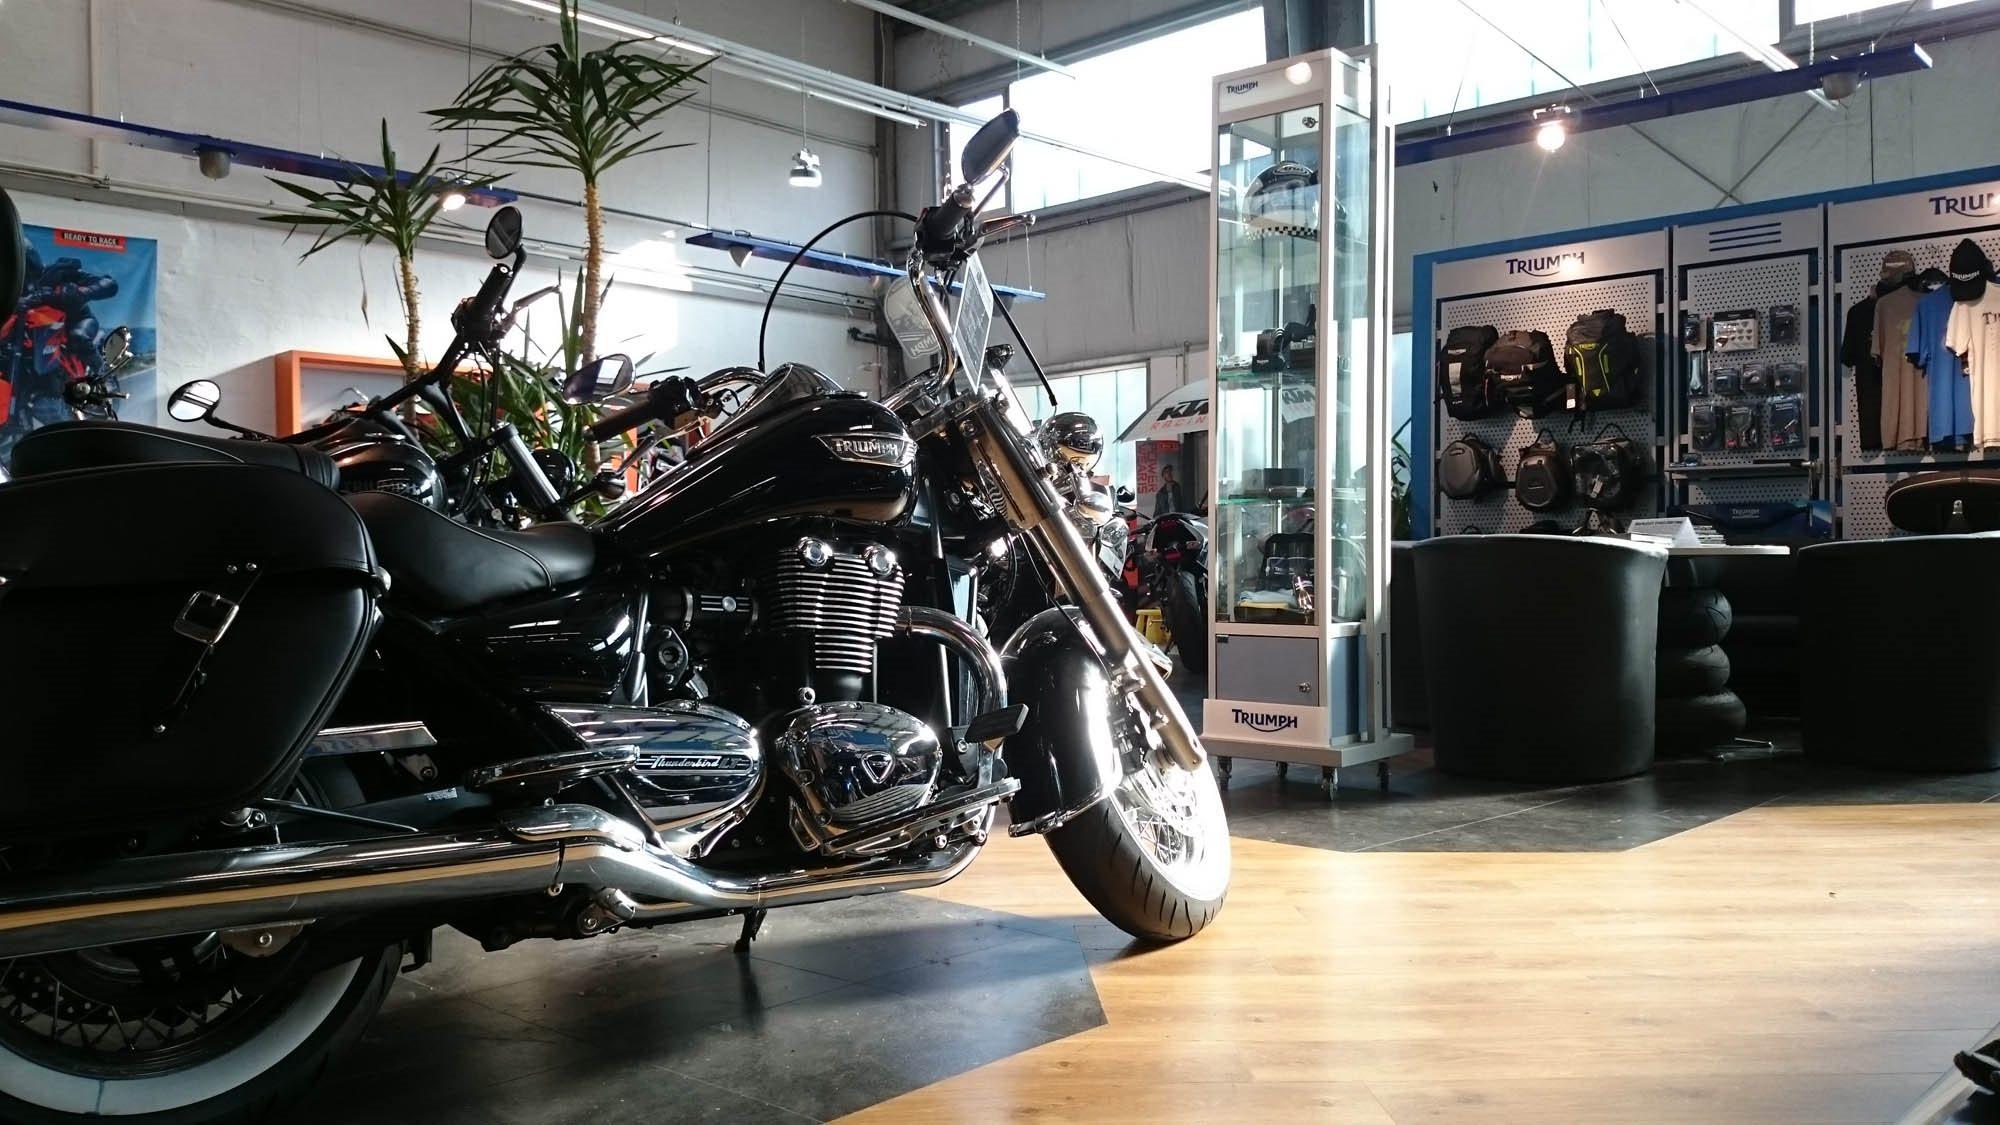 hmf service motorrad piaggio mainfranken by hmf. Black Bedroom Furniture Sets. Home Design Ideas